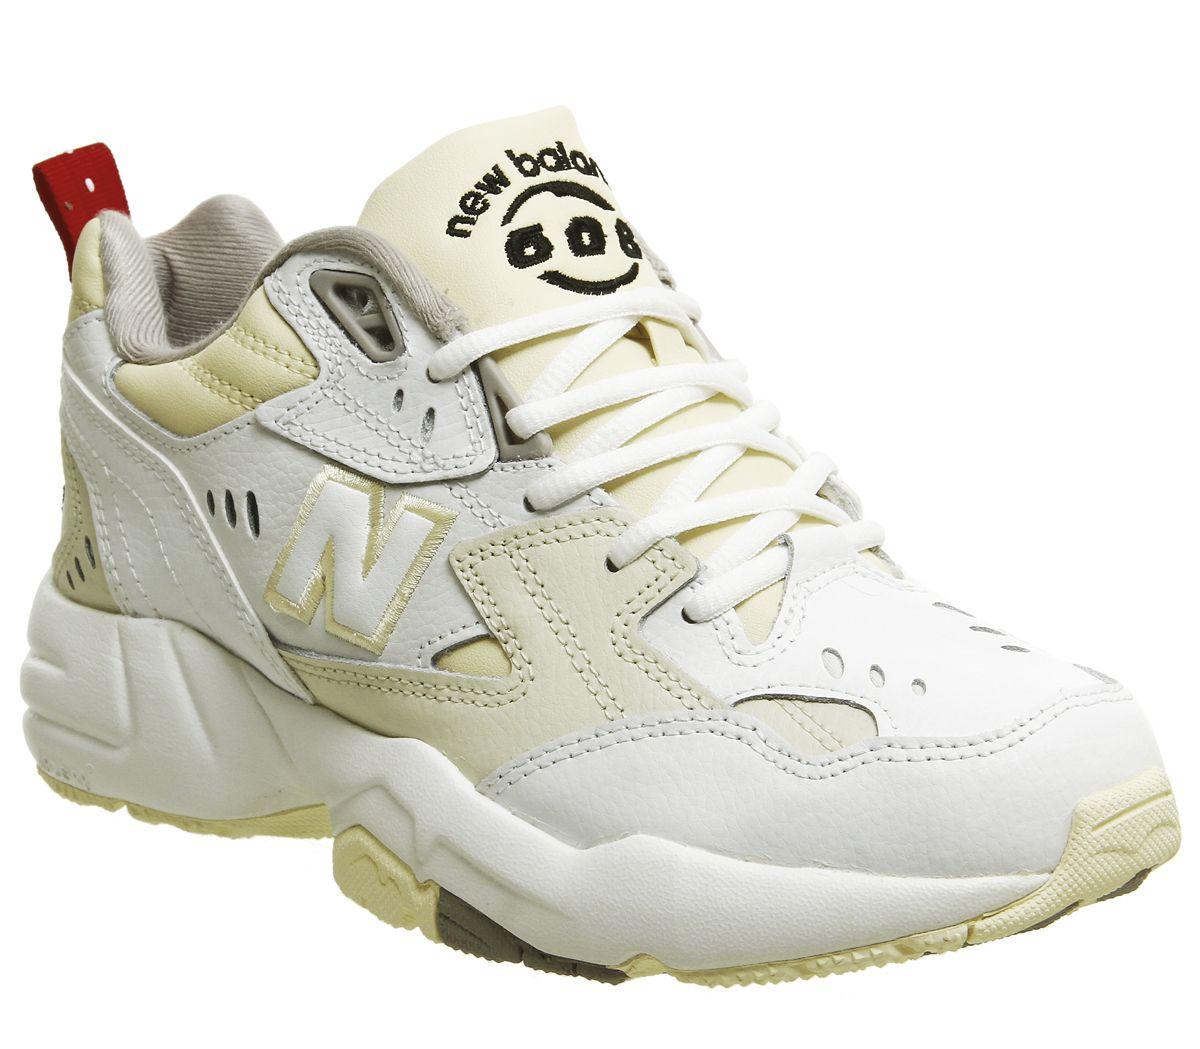 23994f004f2c New Balance 608 Trainers White Cream - Hers trainers